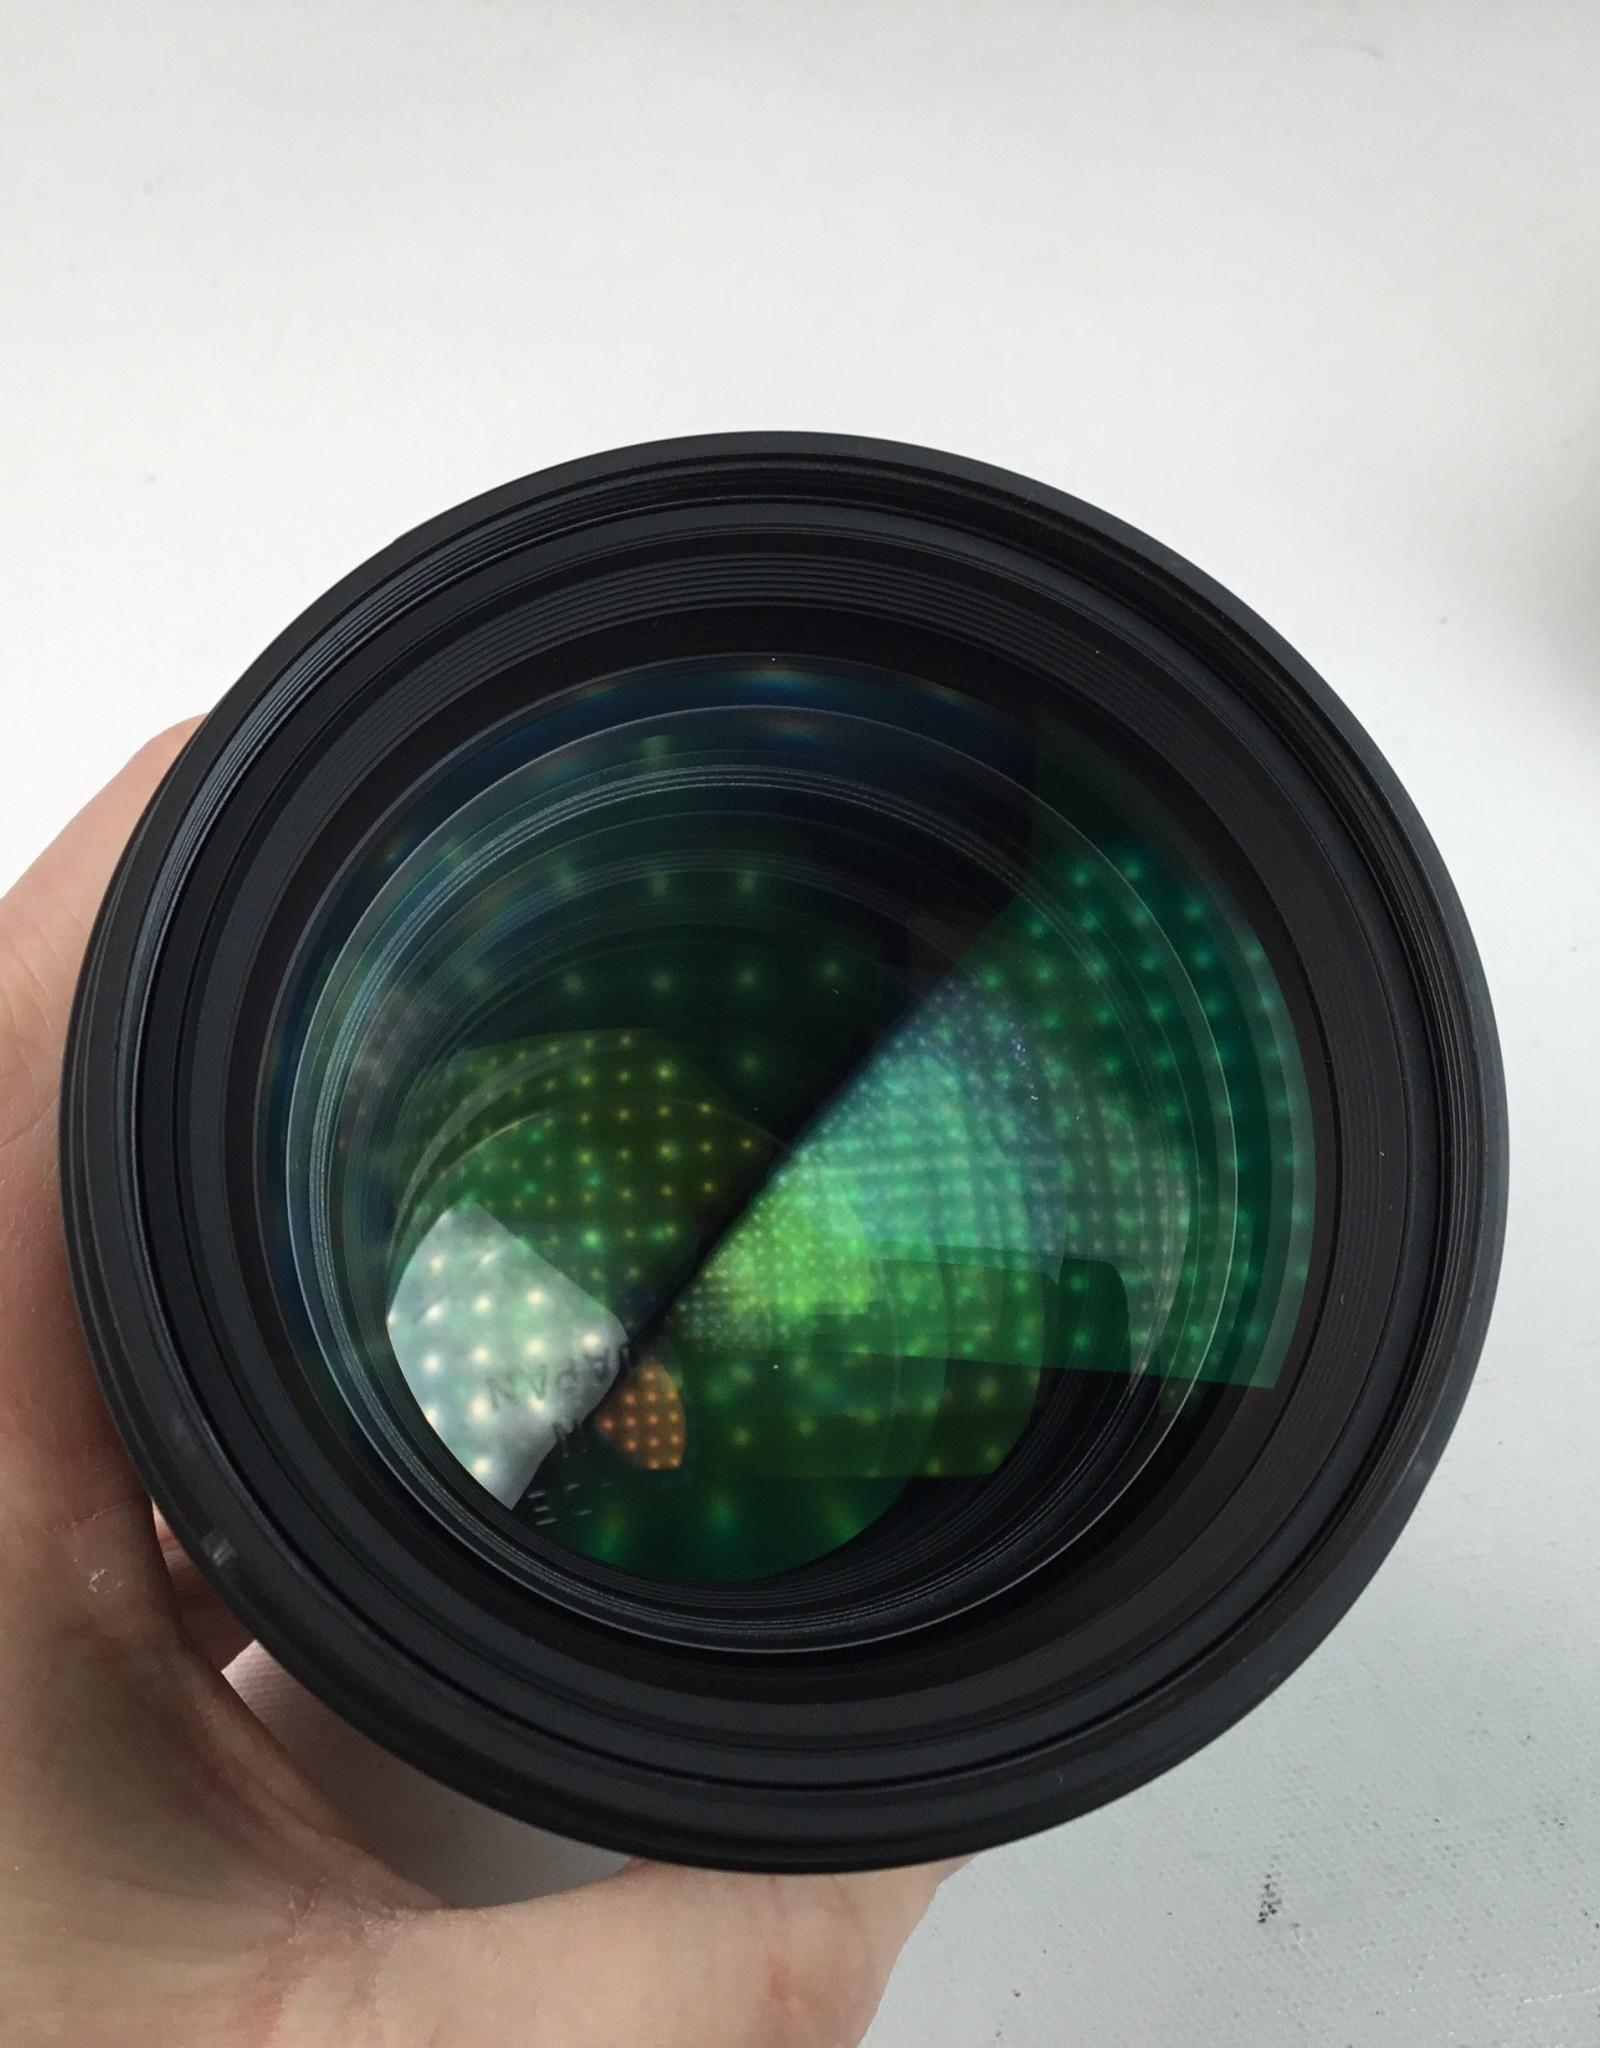 SIGMA Sigma 85mm f1.4 DG Art Lens for Nikon Used EX+